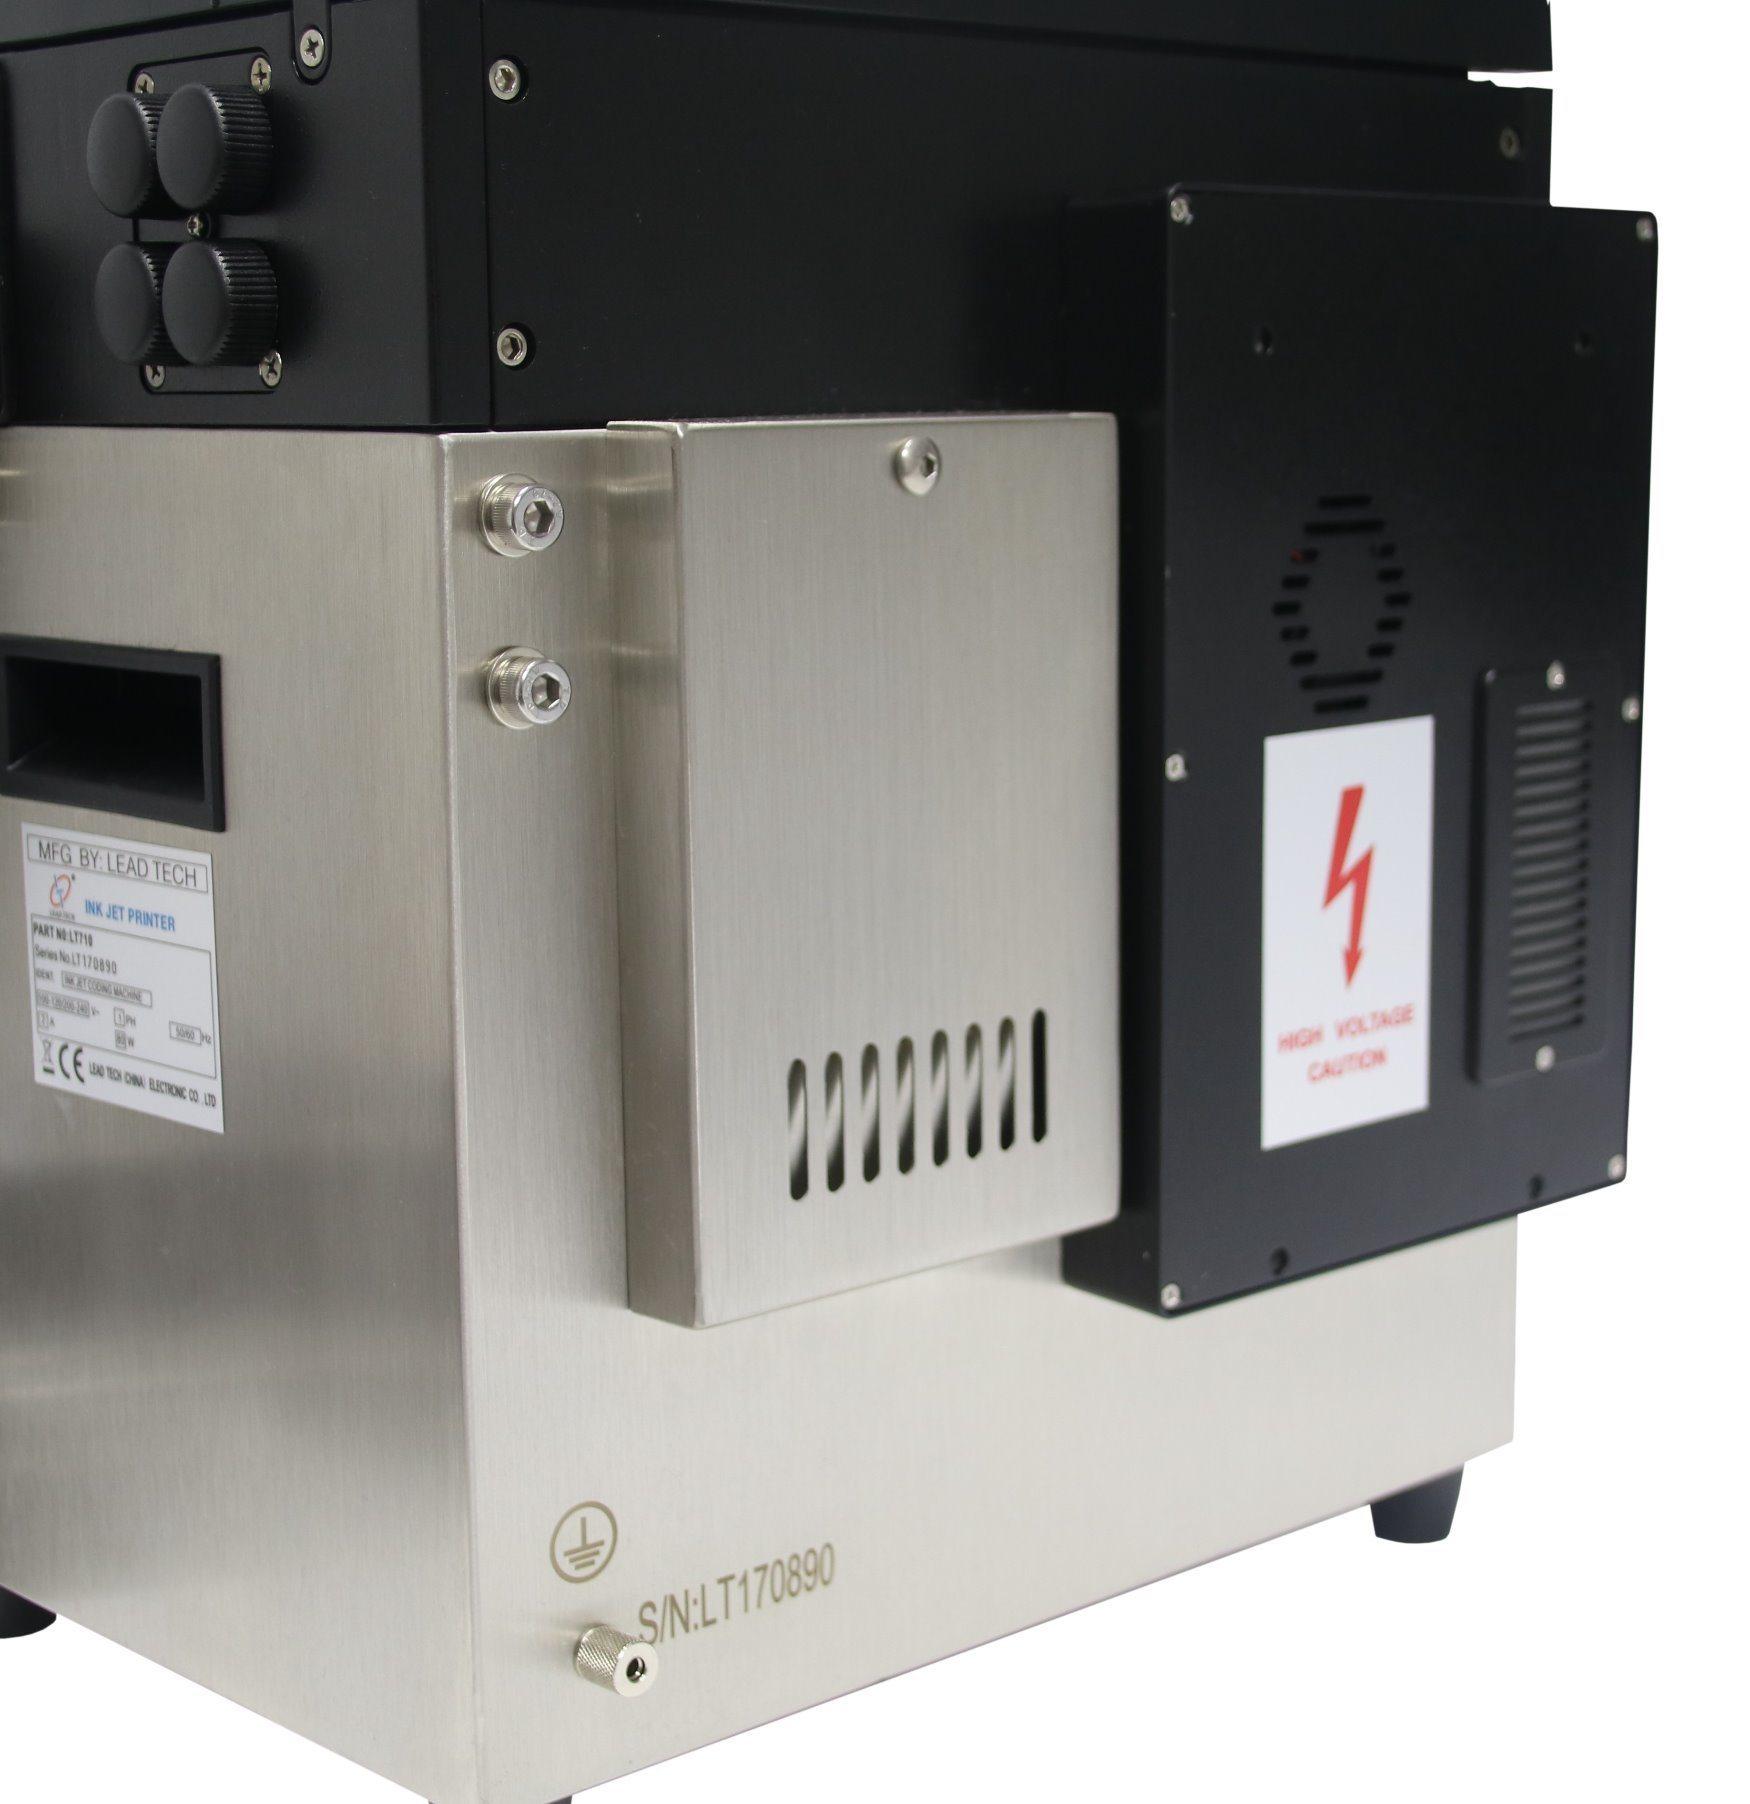 Lead Tech Lt760 Plastic film Cij Inkjet Printer